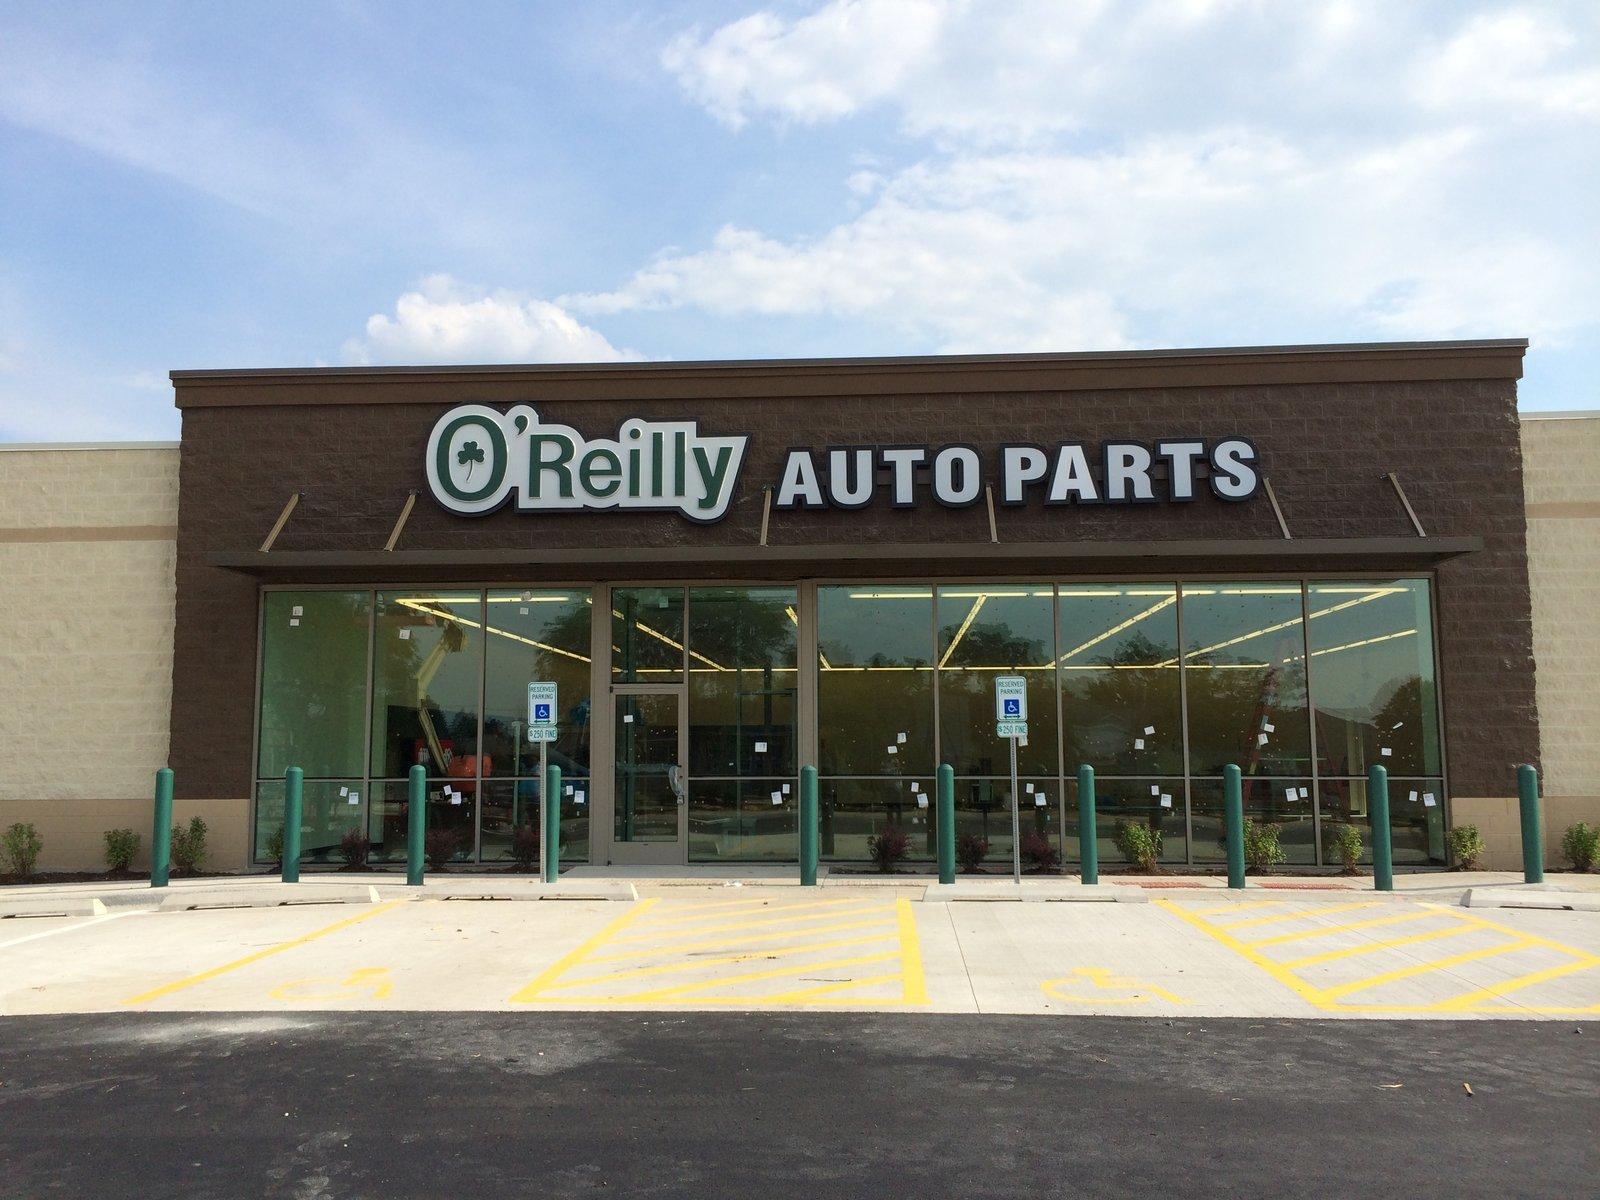 o'reilly auto parts - photo #33